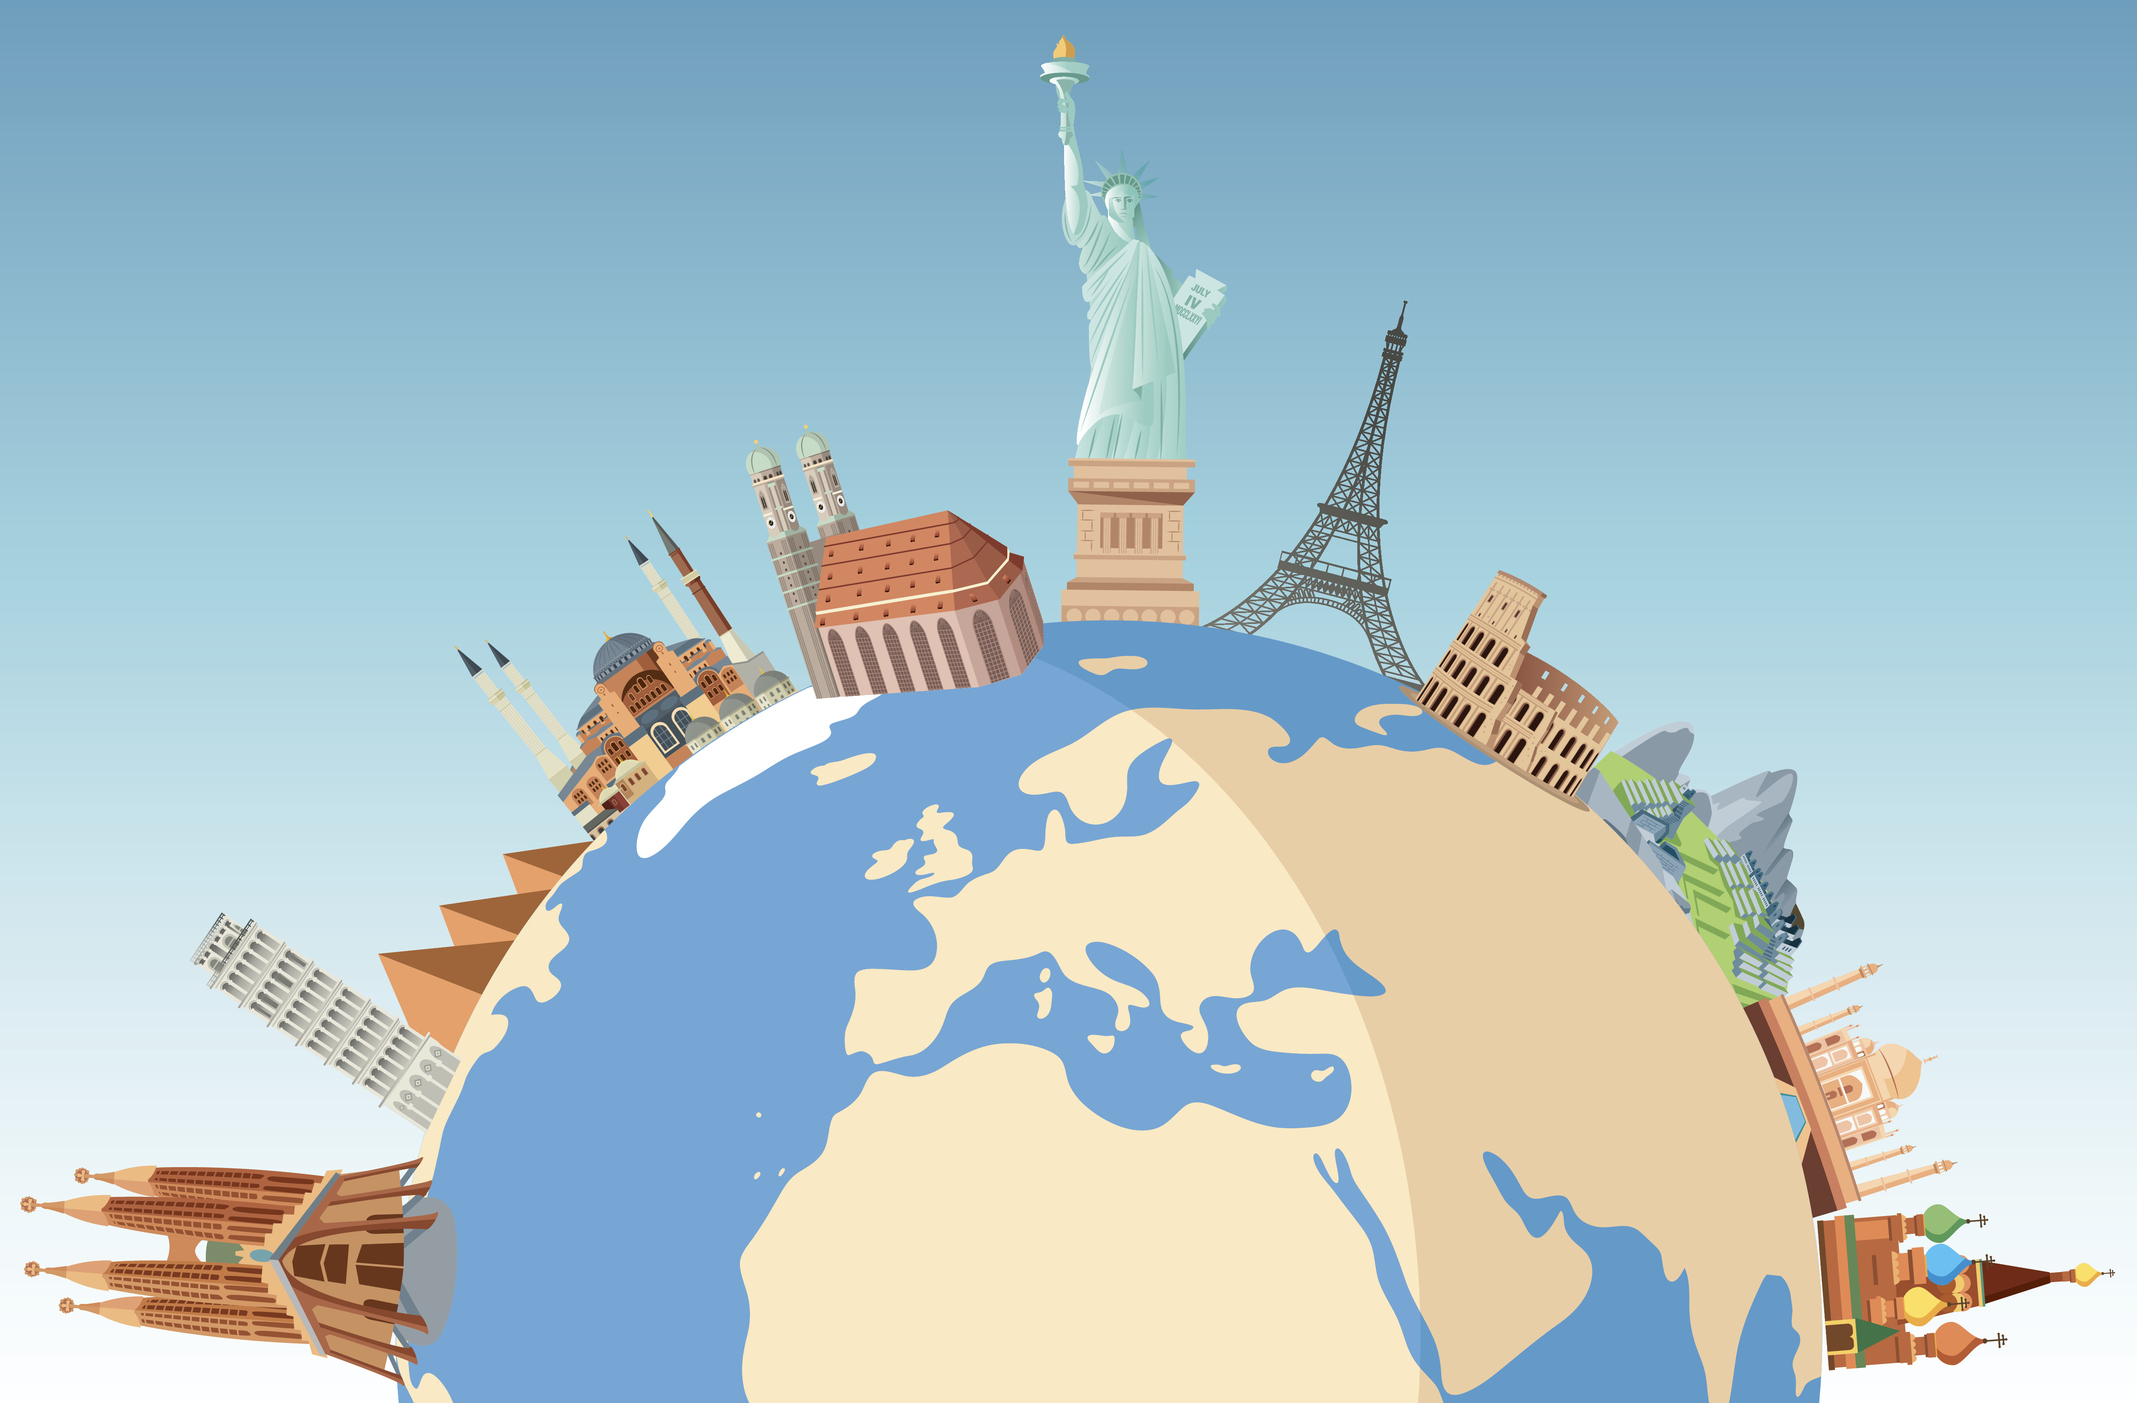 Turismens historia i kort